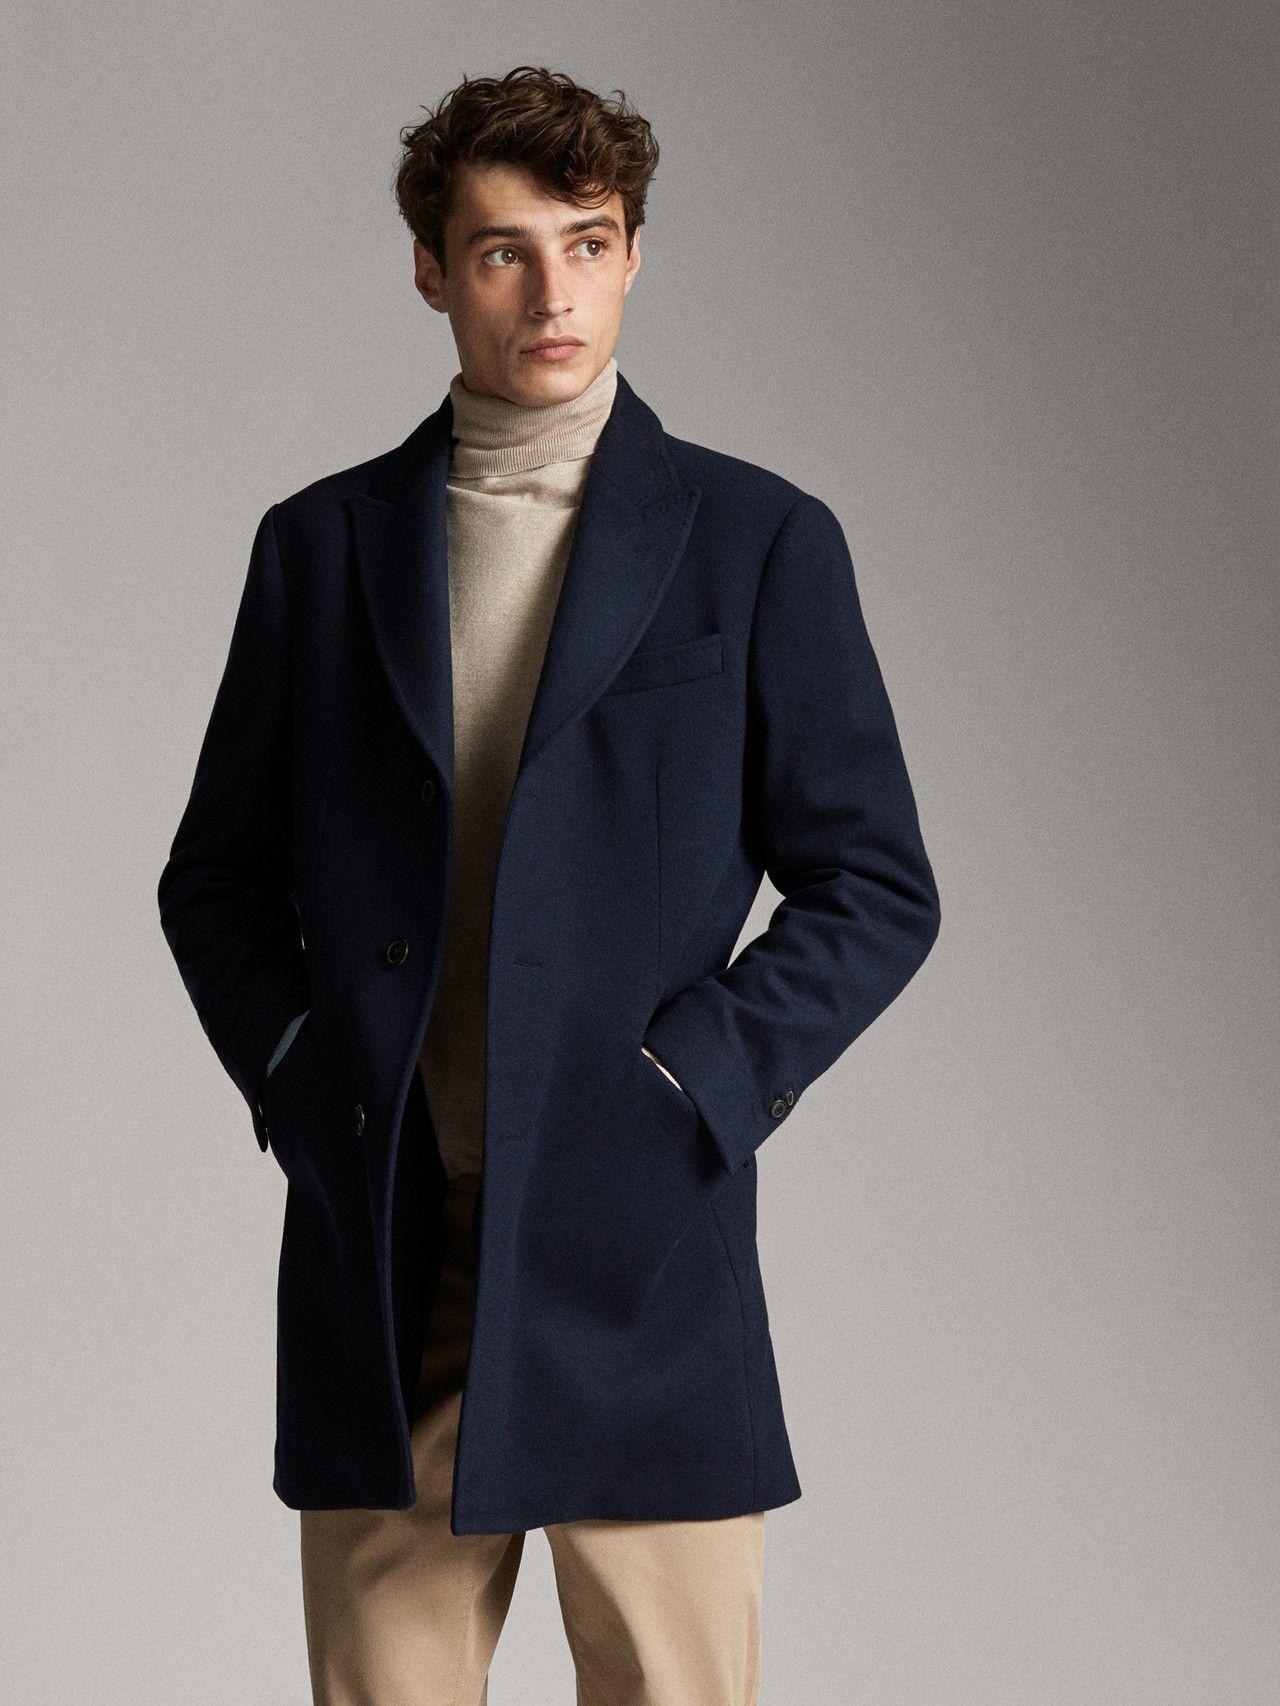 Zalando herren mantel   Kurzmäntel für Herren